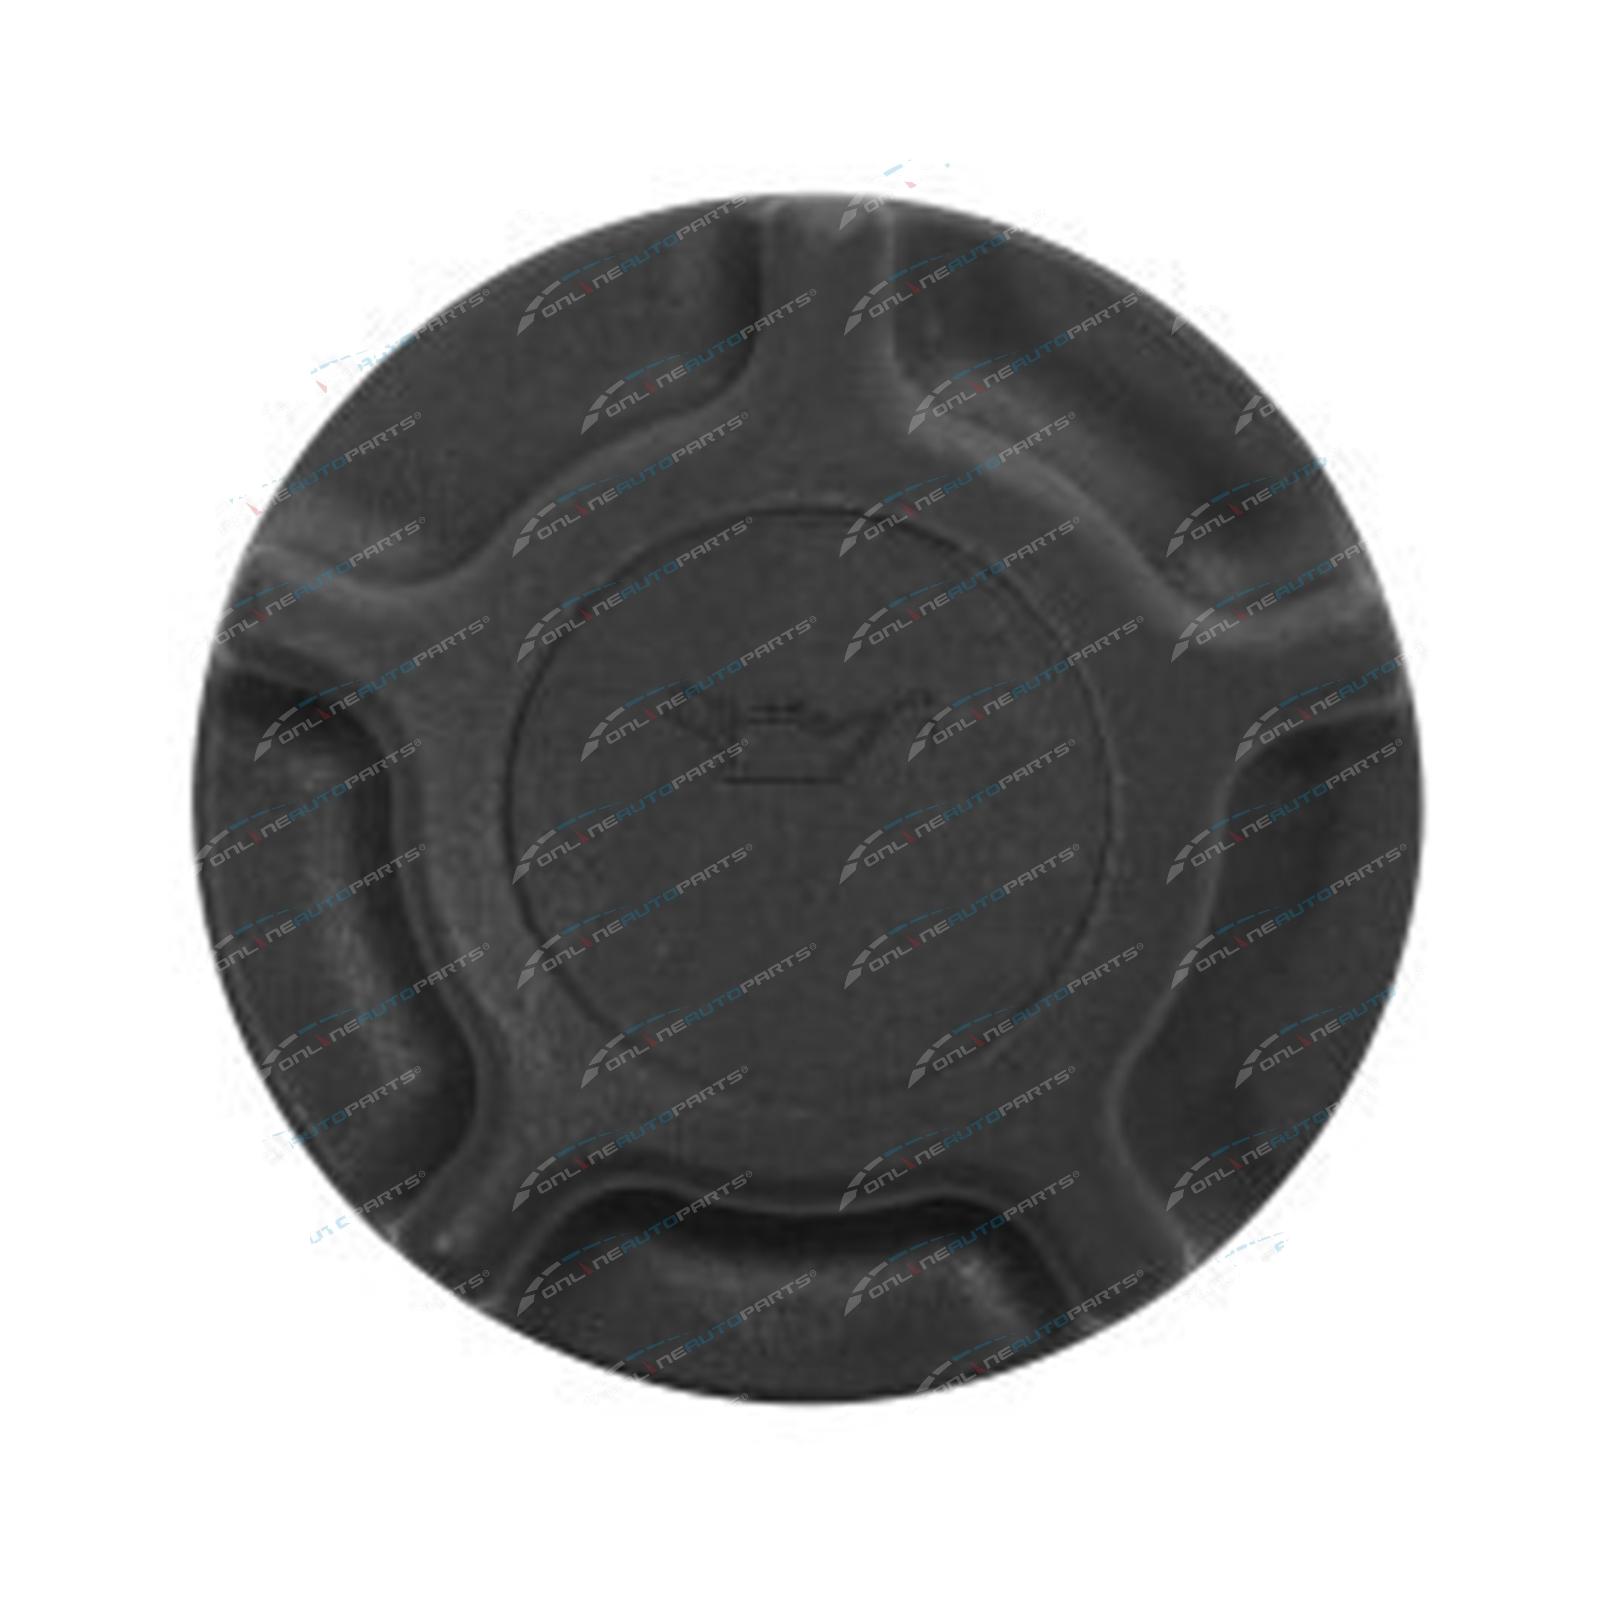 TOC539 - Engine Oil Cap Plastic push and turn - Tridon